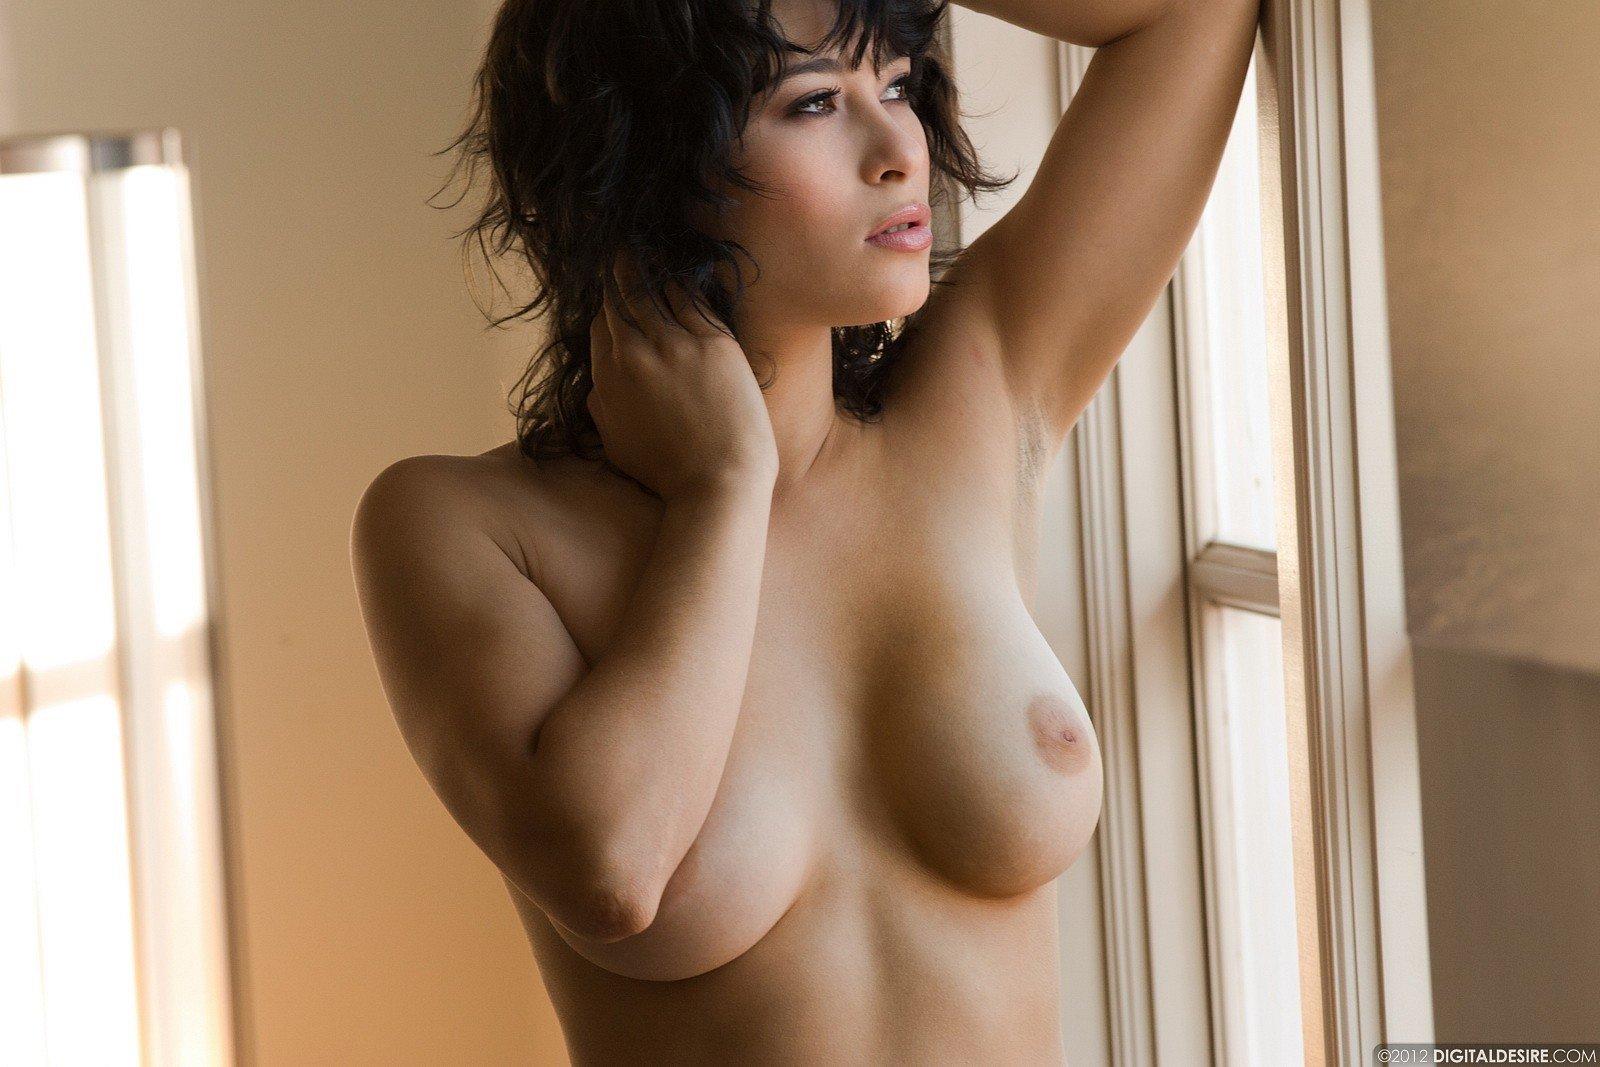 Digital desire raven rockette nude